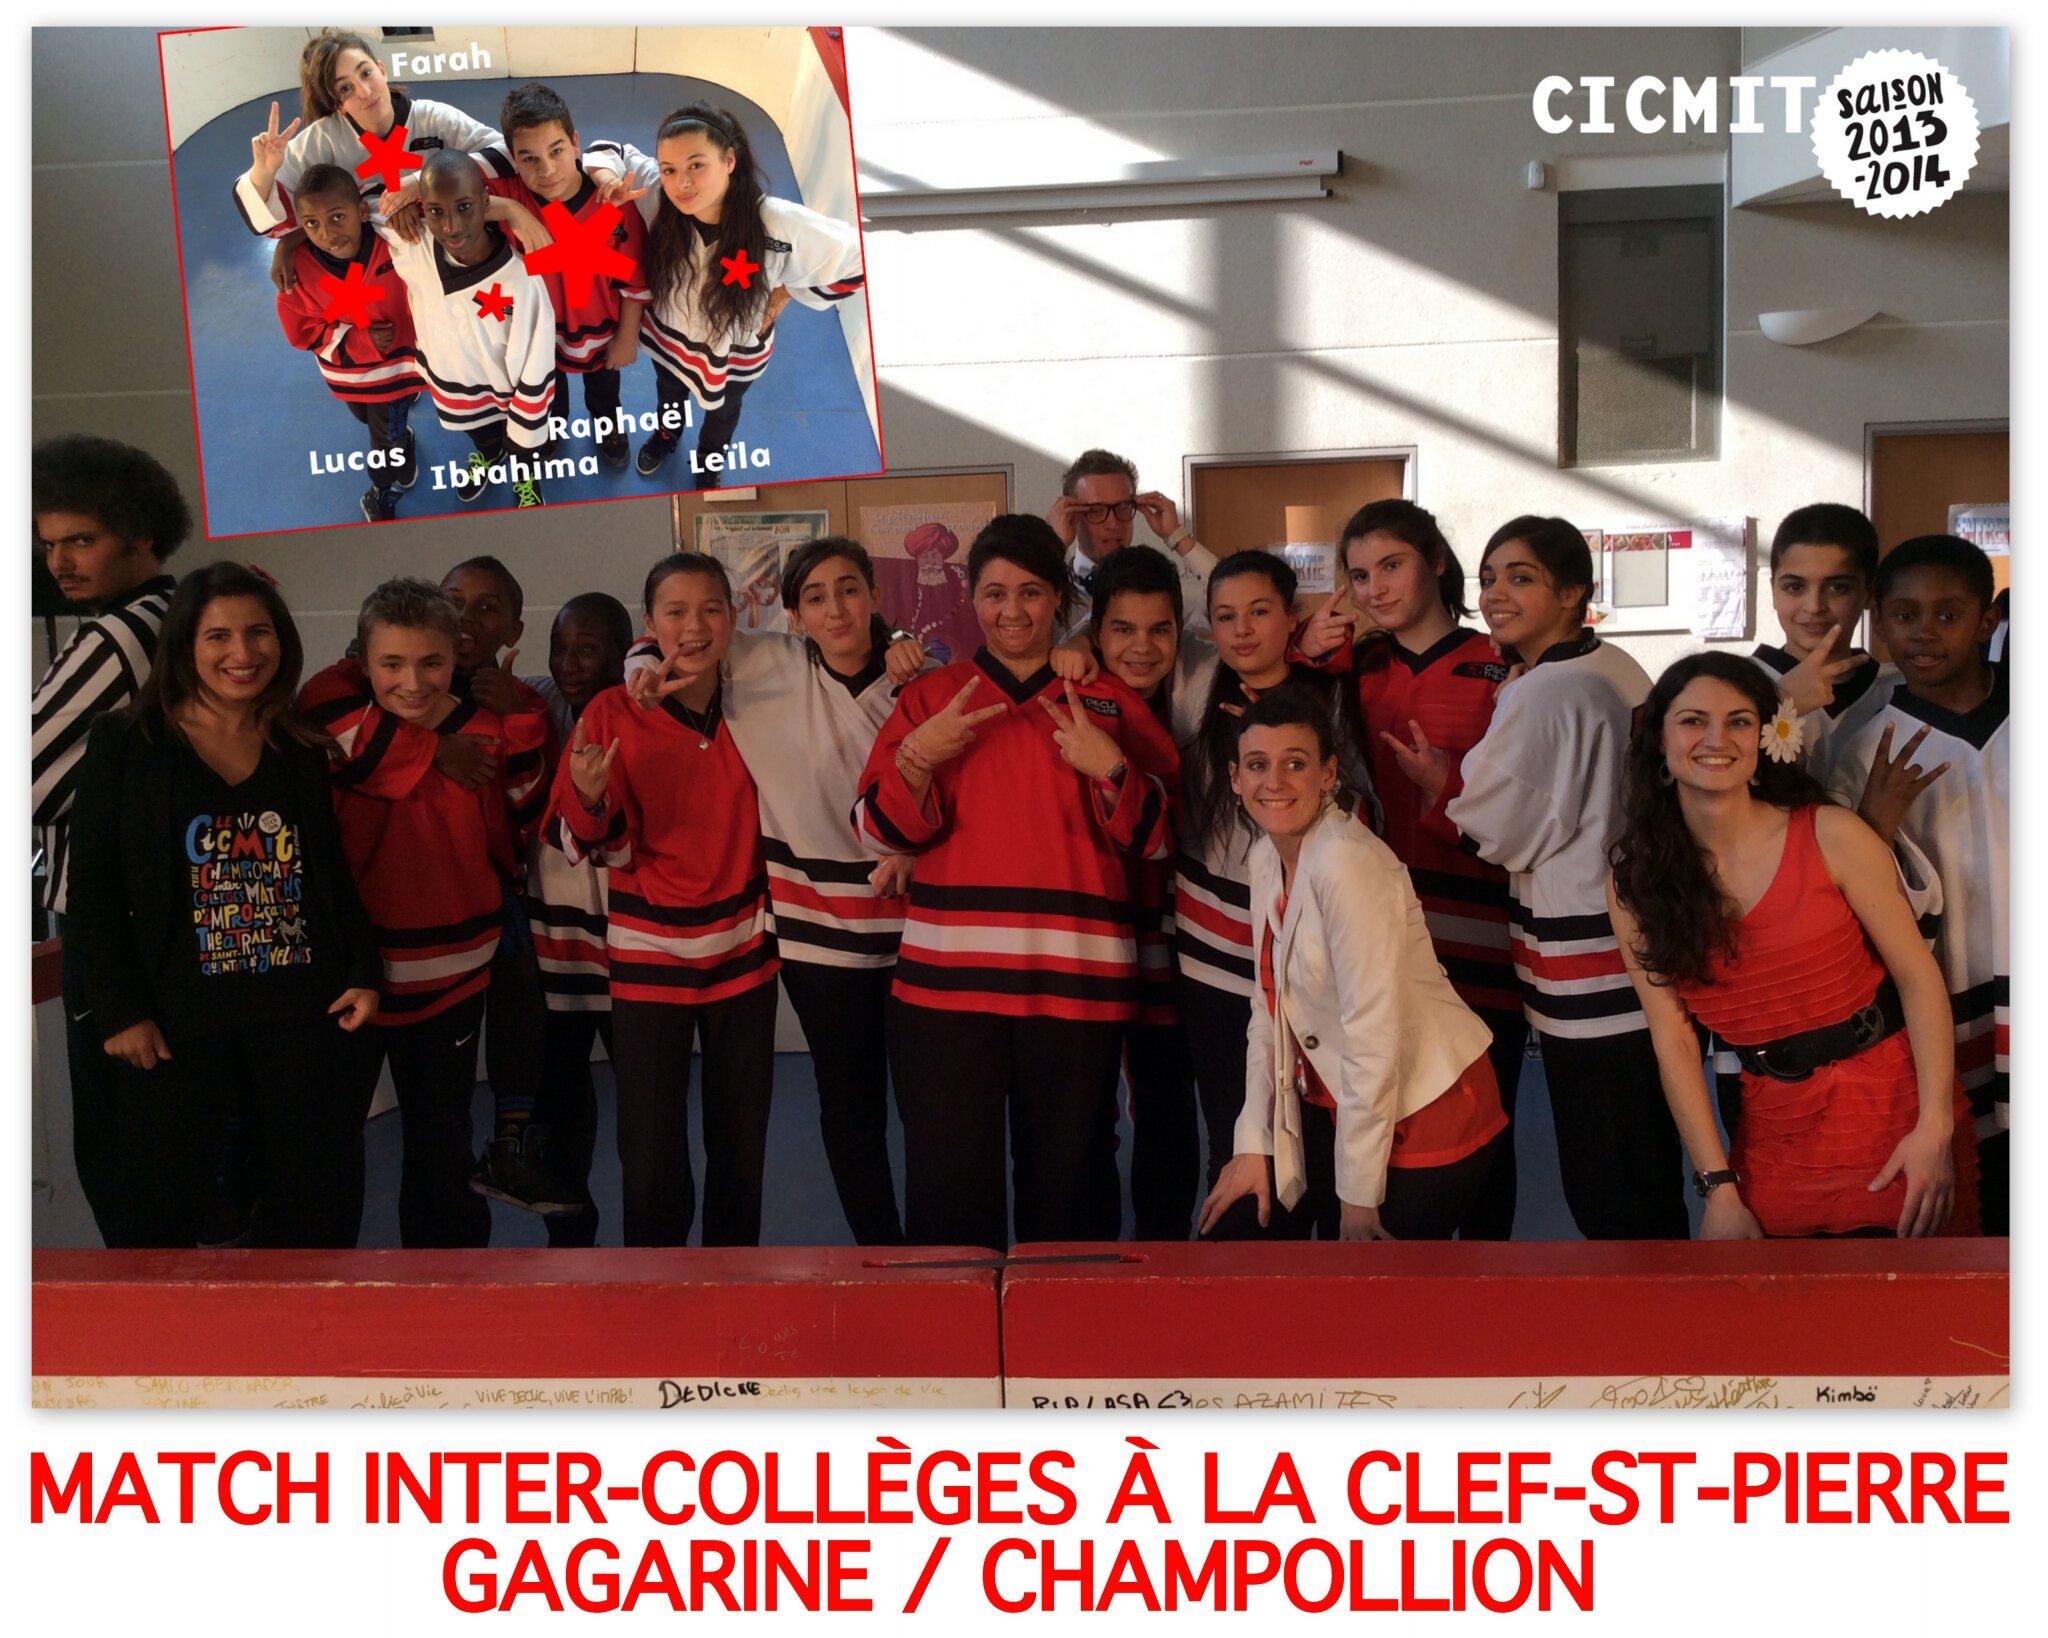 INTER CICMIT15 LA CLEF ST PIERRE - 11_03